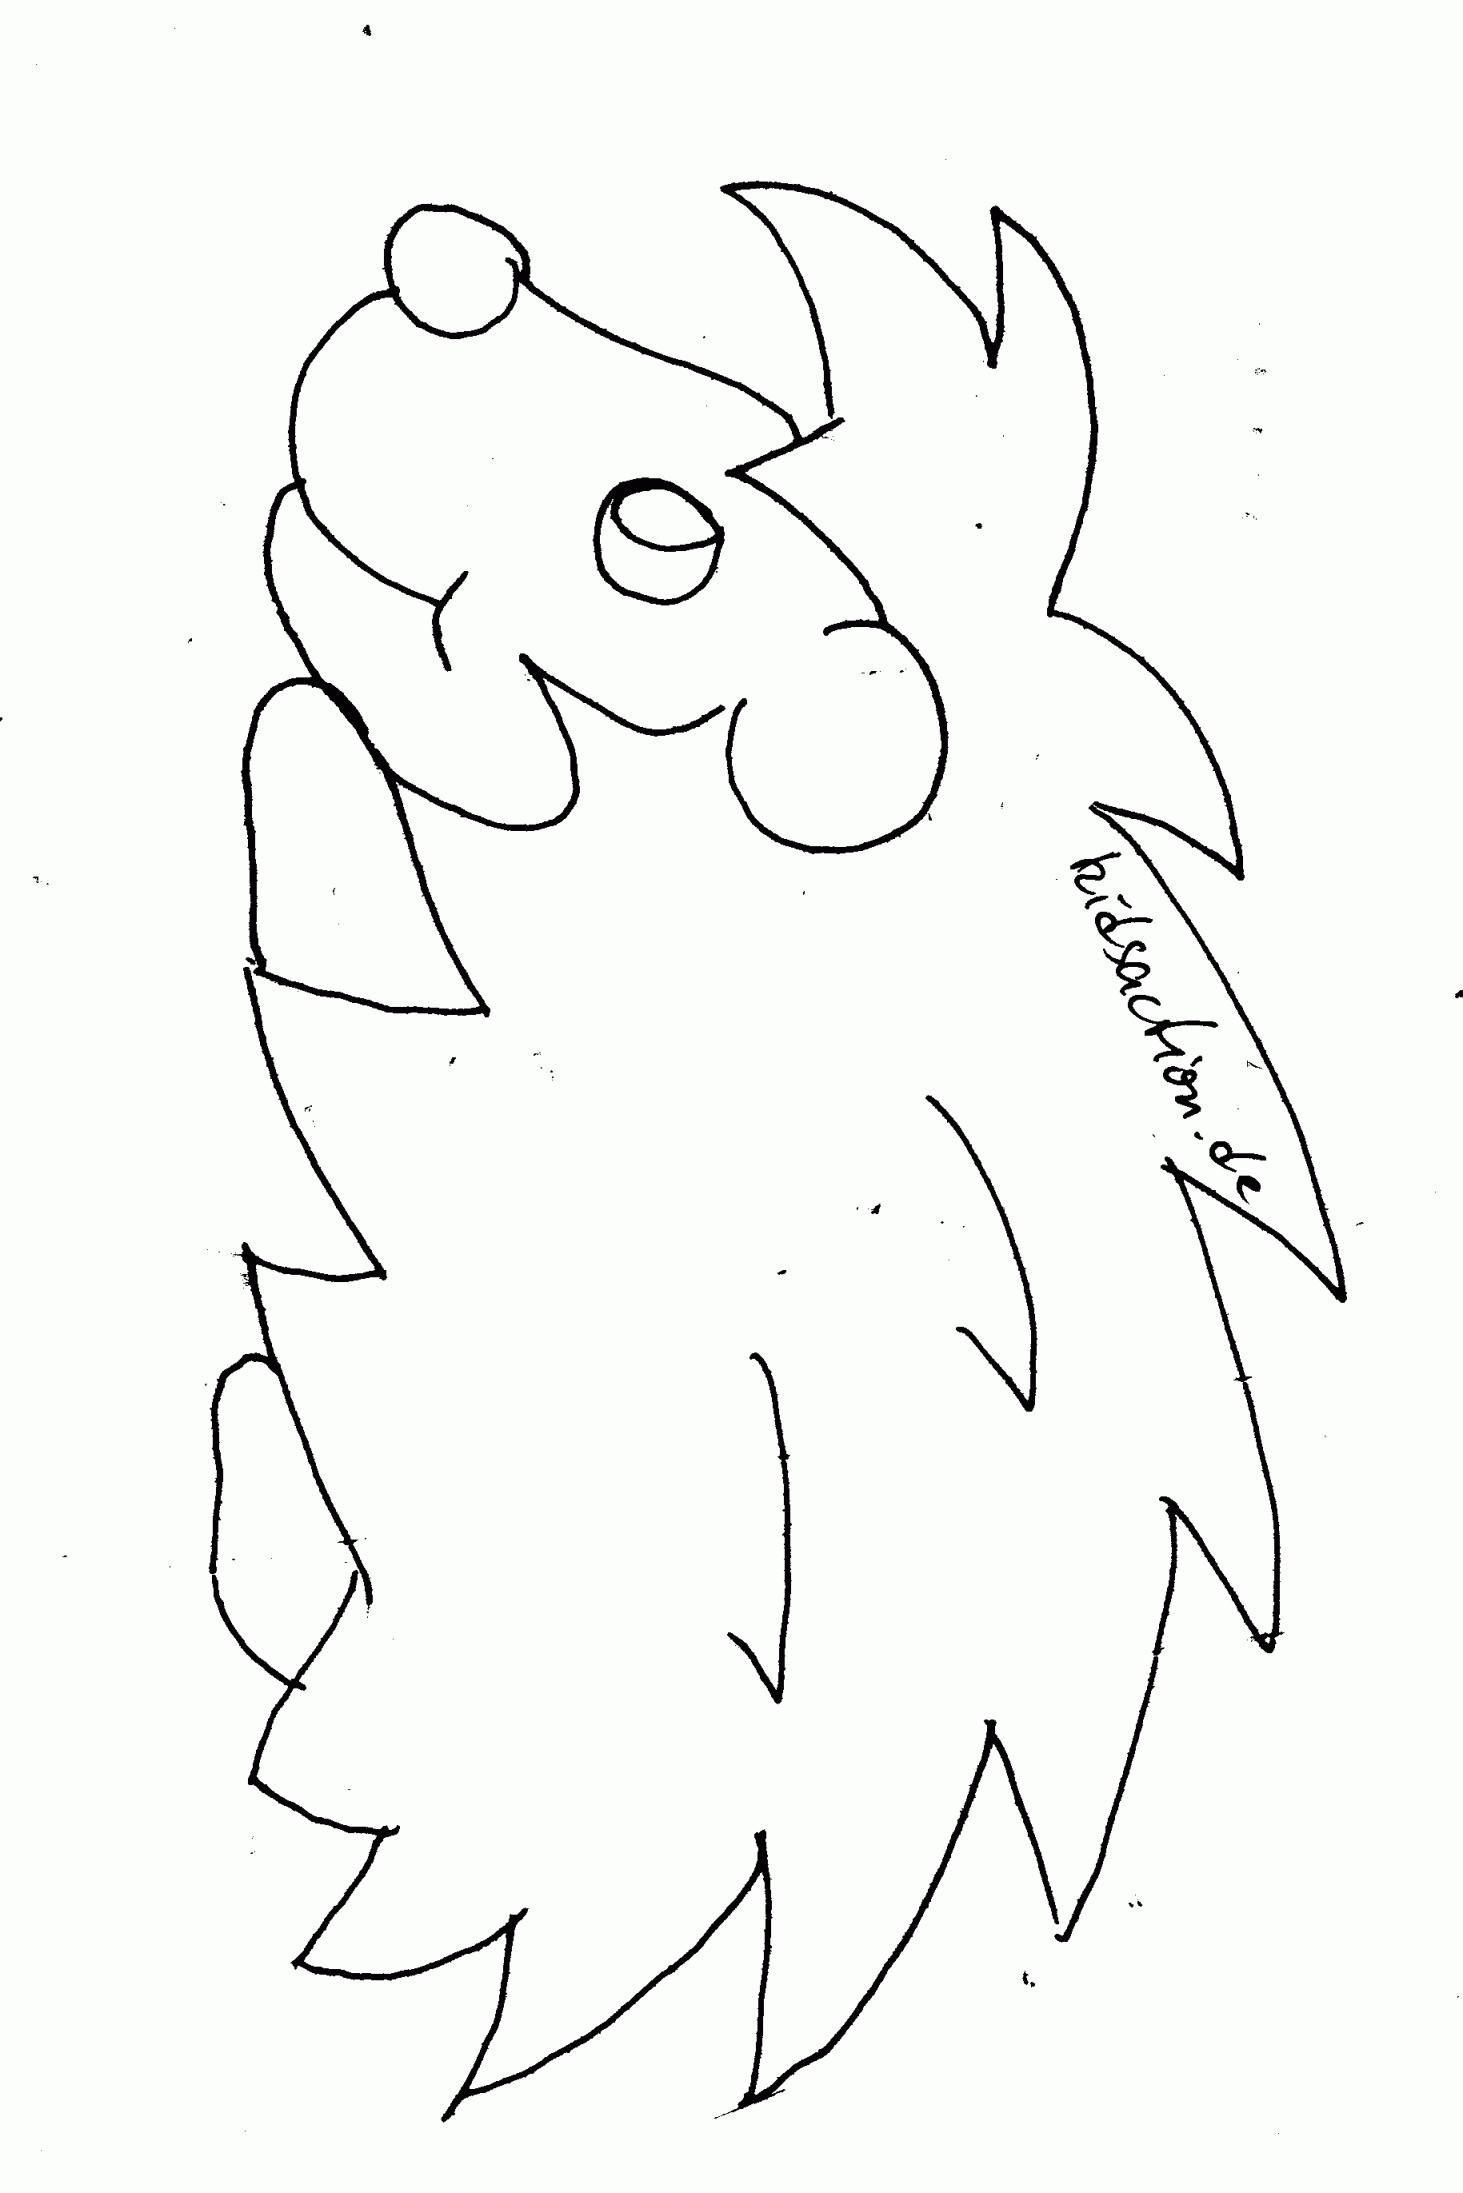 Ninjago Jay Ausmalbild Inspirierend Malvorlagen Igel Elegant Igel Grundschule 0d Archives Uploadertalk Das Bild